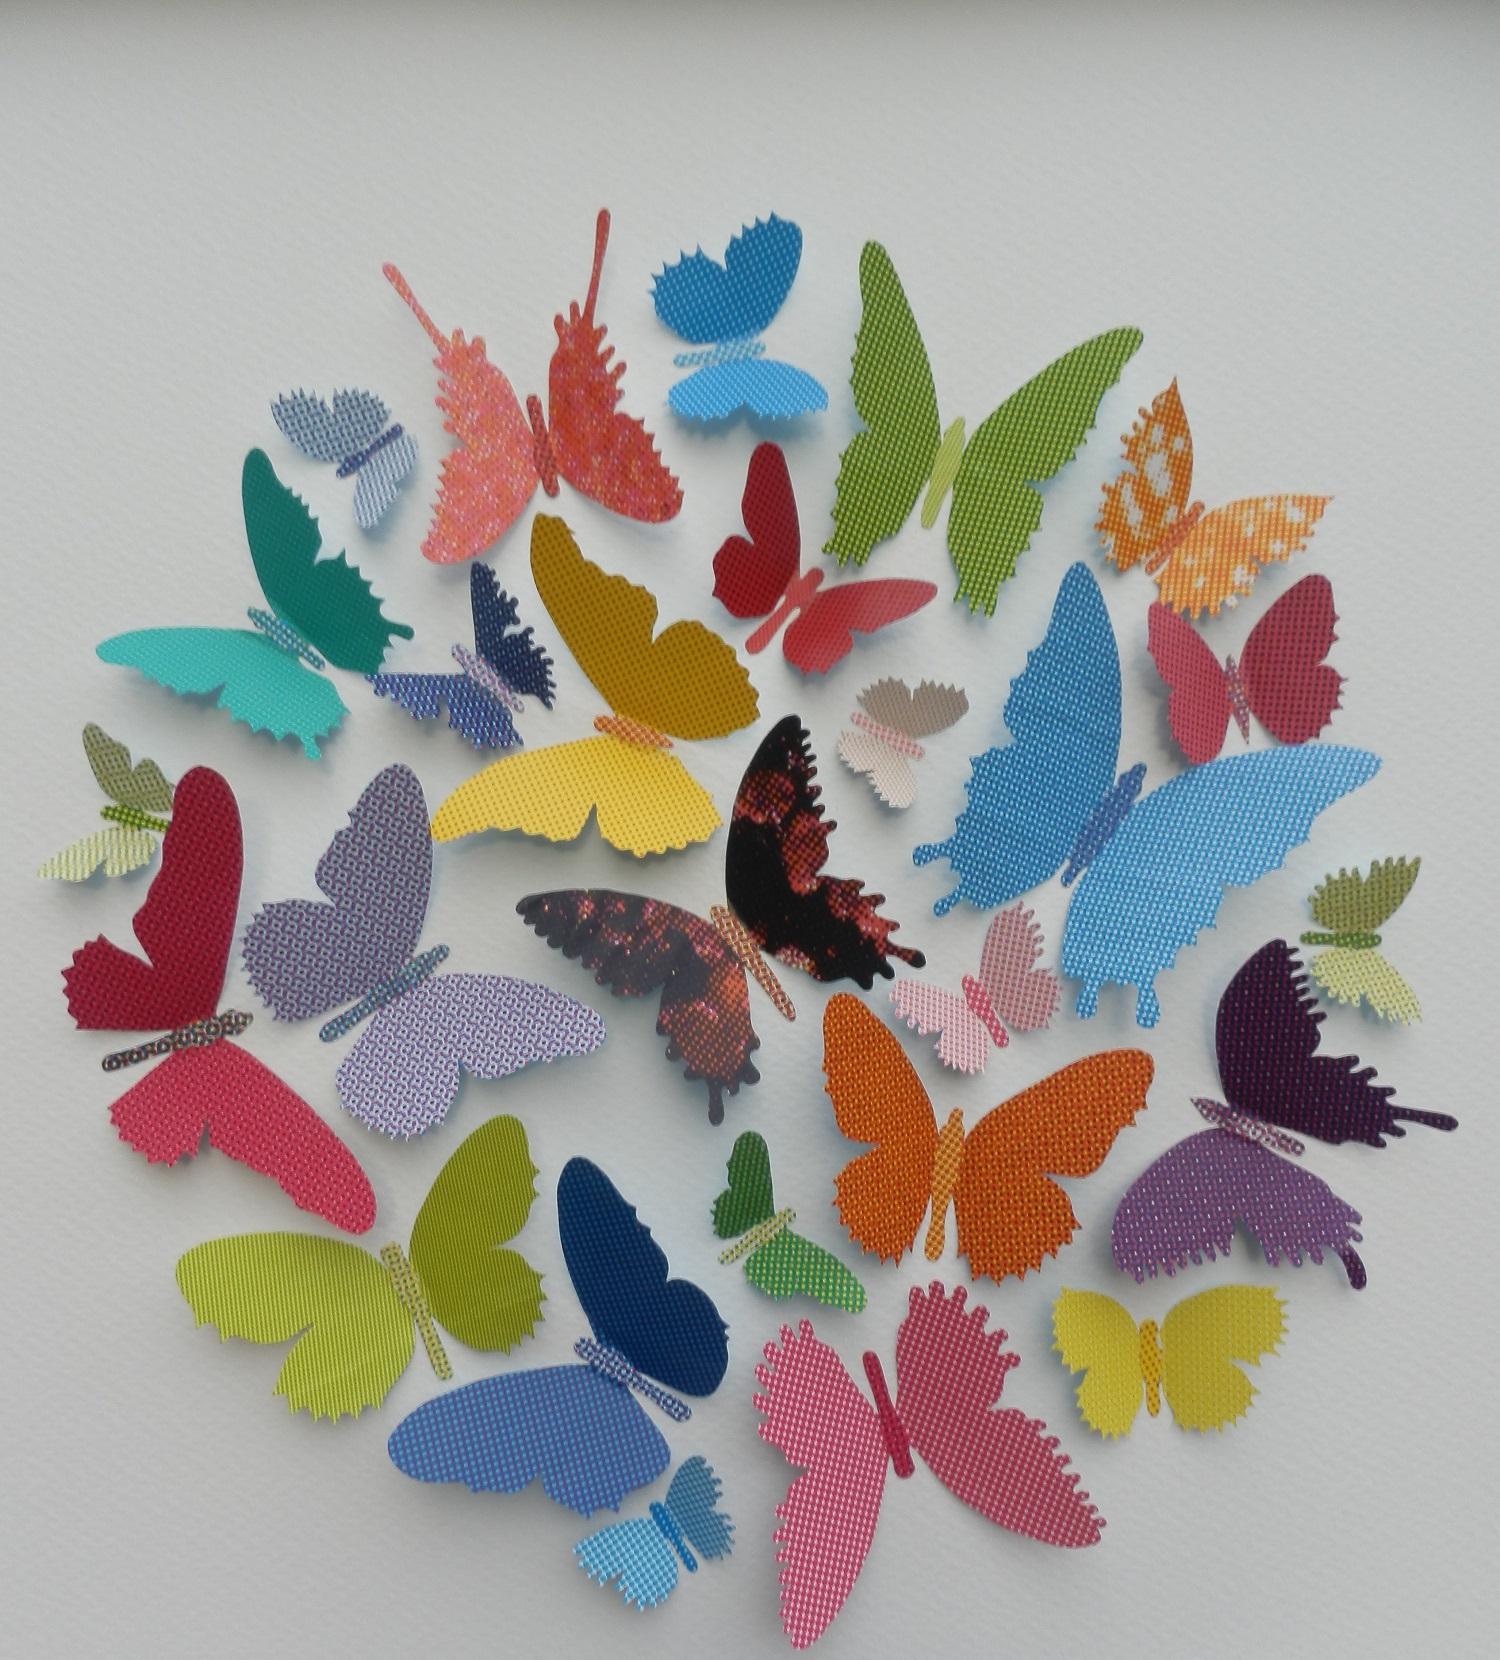 Butterfly Ball  mixed media  53 x 53 cm